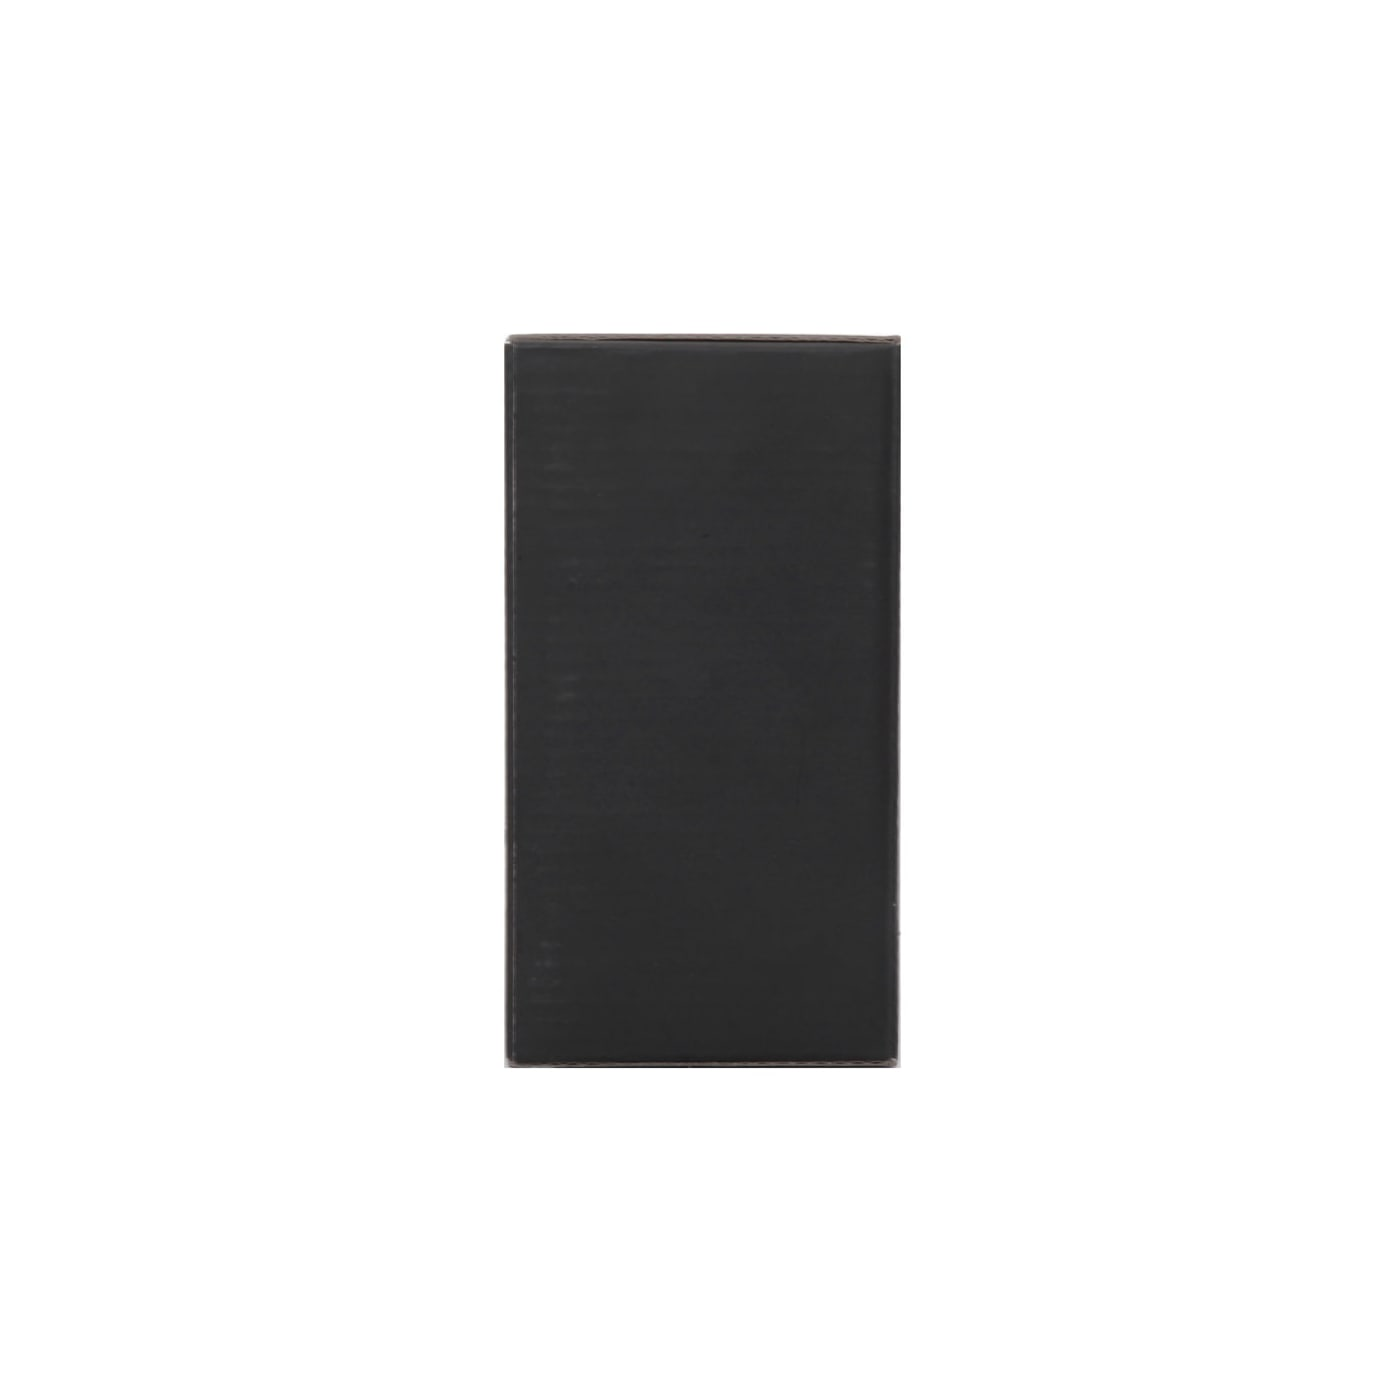 SPE COUPLER OVAL 4 ROUND BLACK 97911